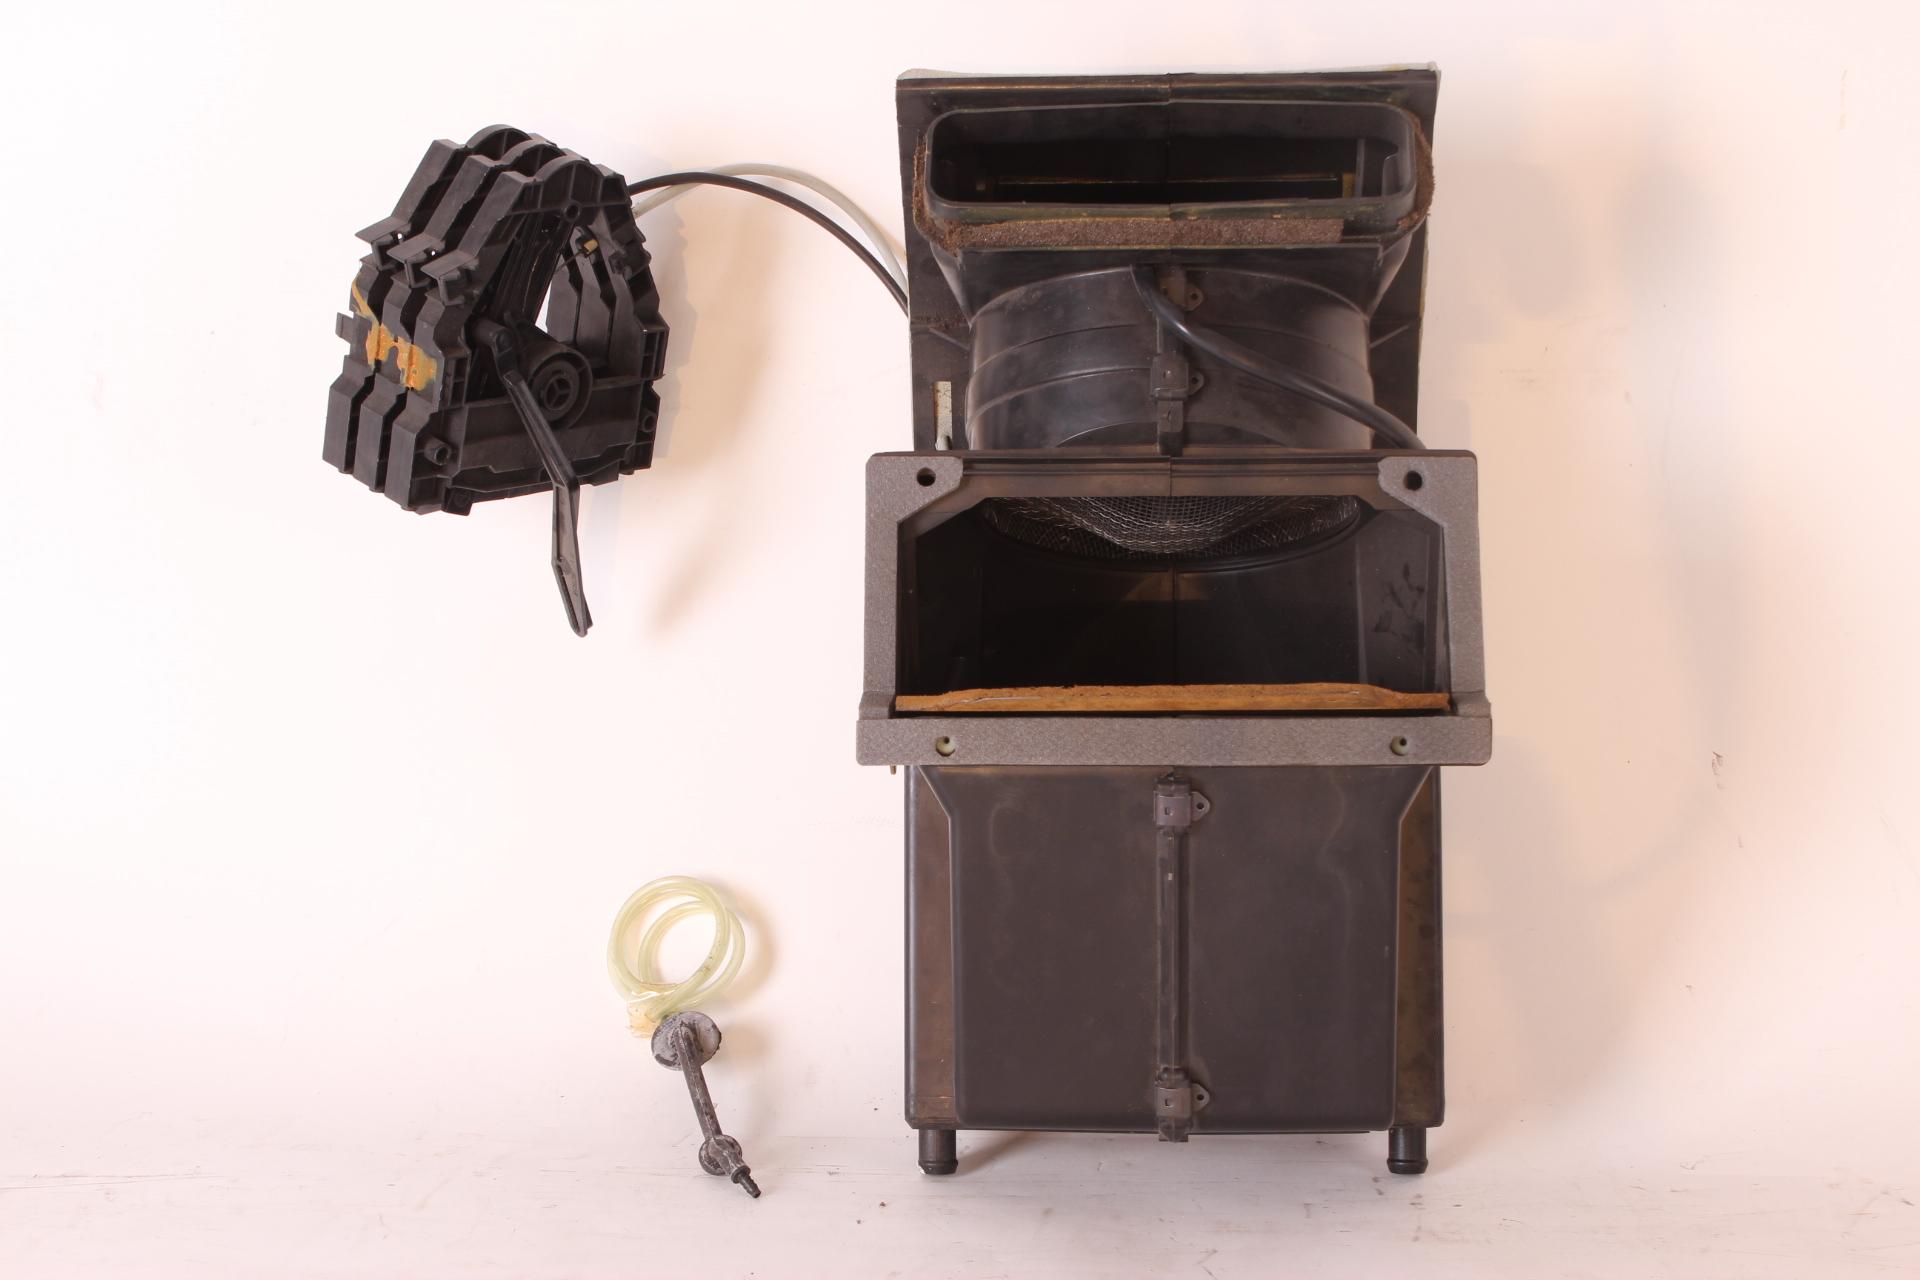 heizung komplett neu alfa 33 905 bj 1988 1990 heizung innenraum alfa 33 alfa teile. Black Bedroom Furniture Sets. Home Design Ideas